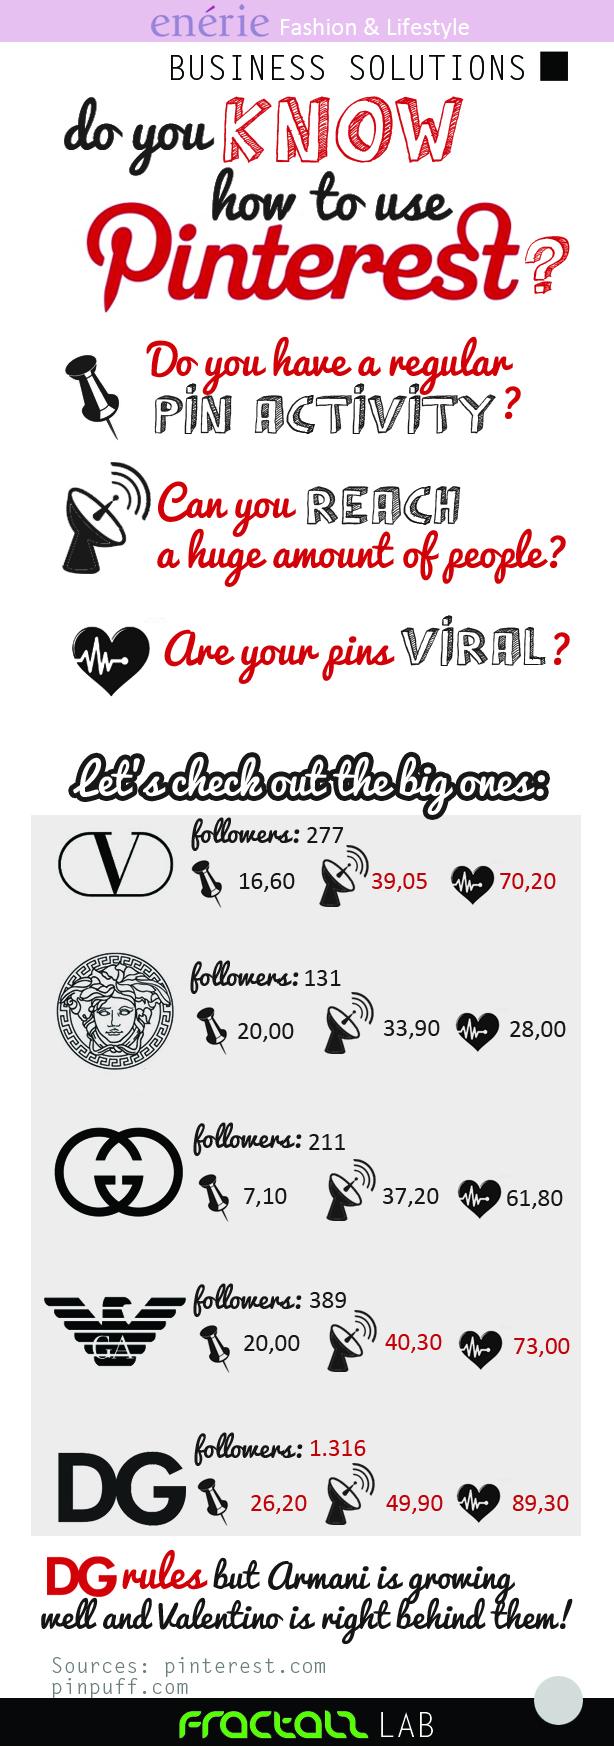 ¿Sabes cómo usar Pinterest?